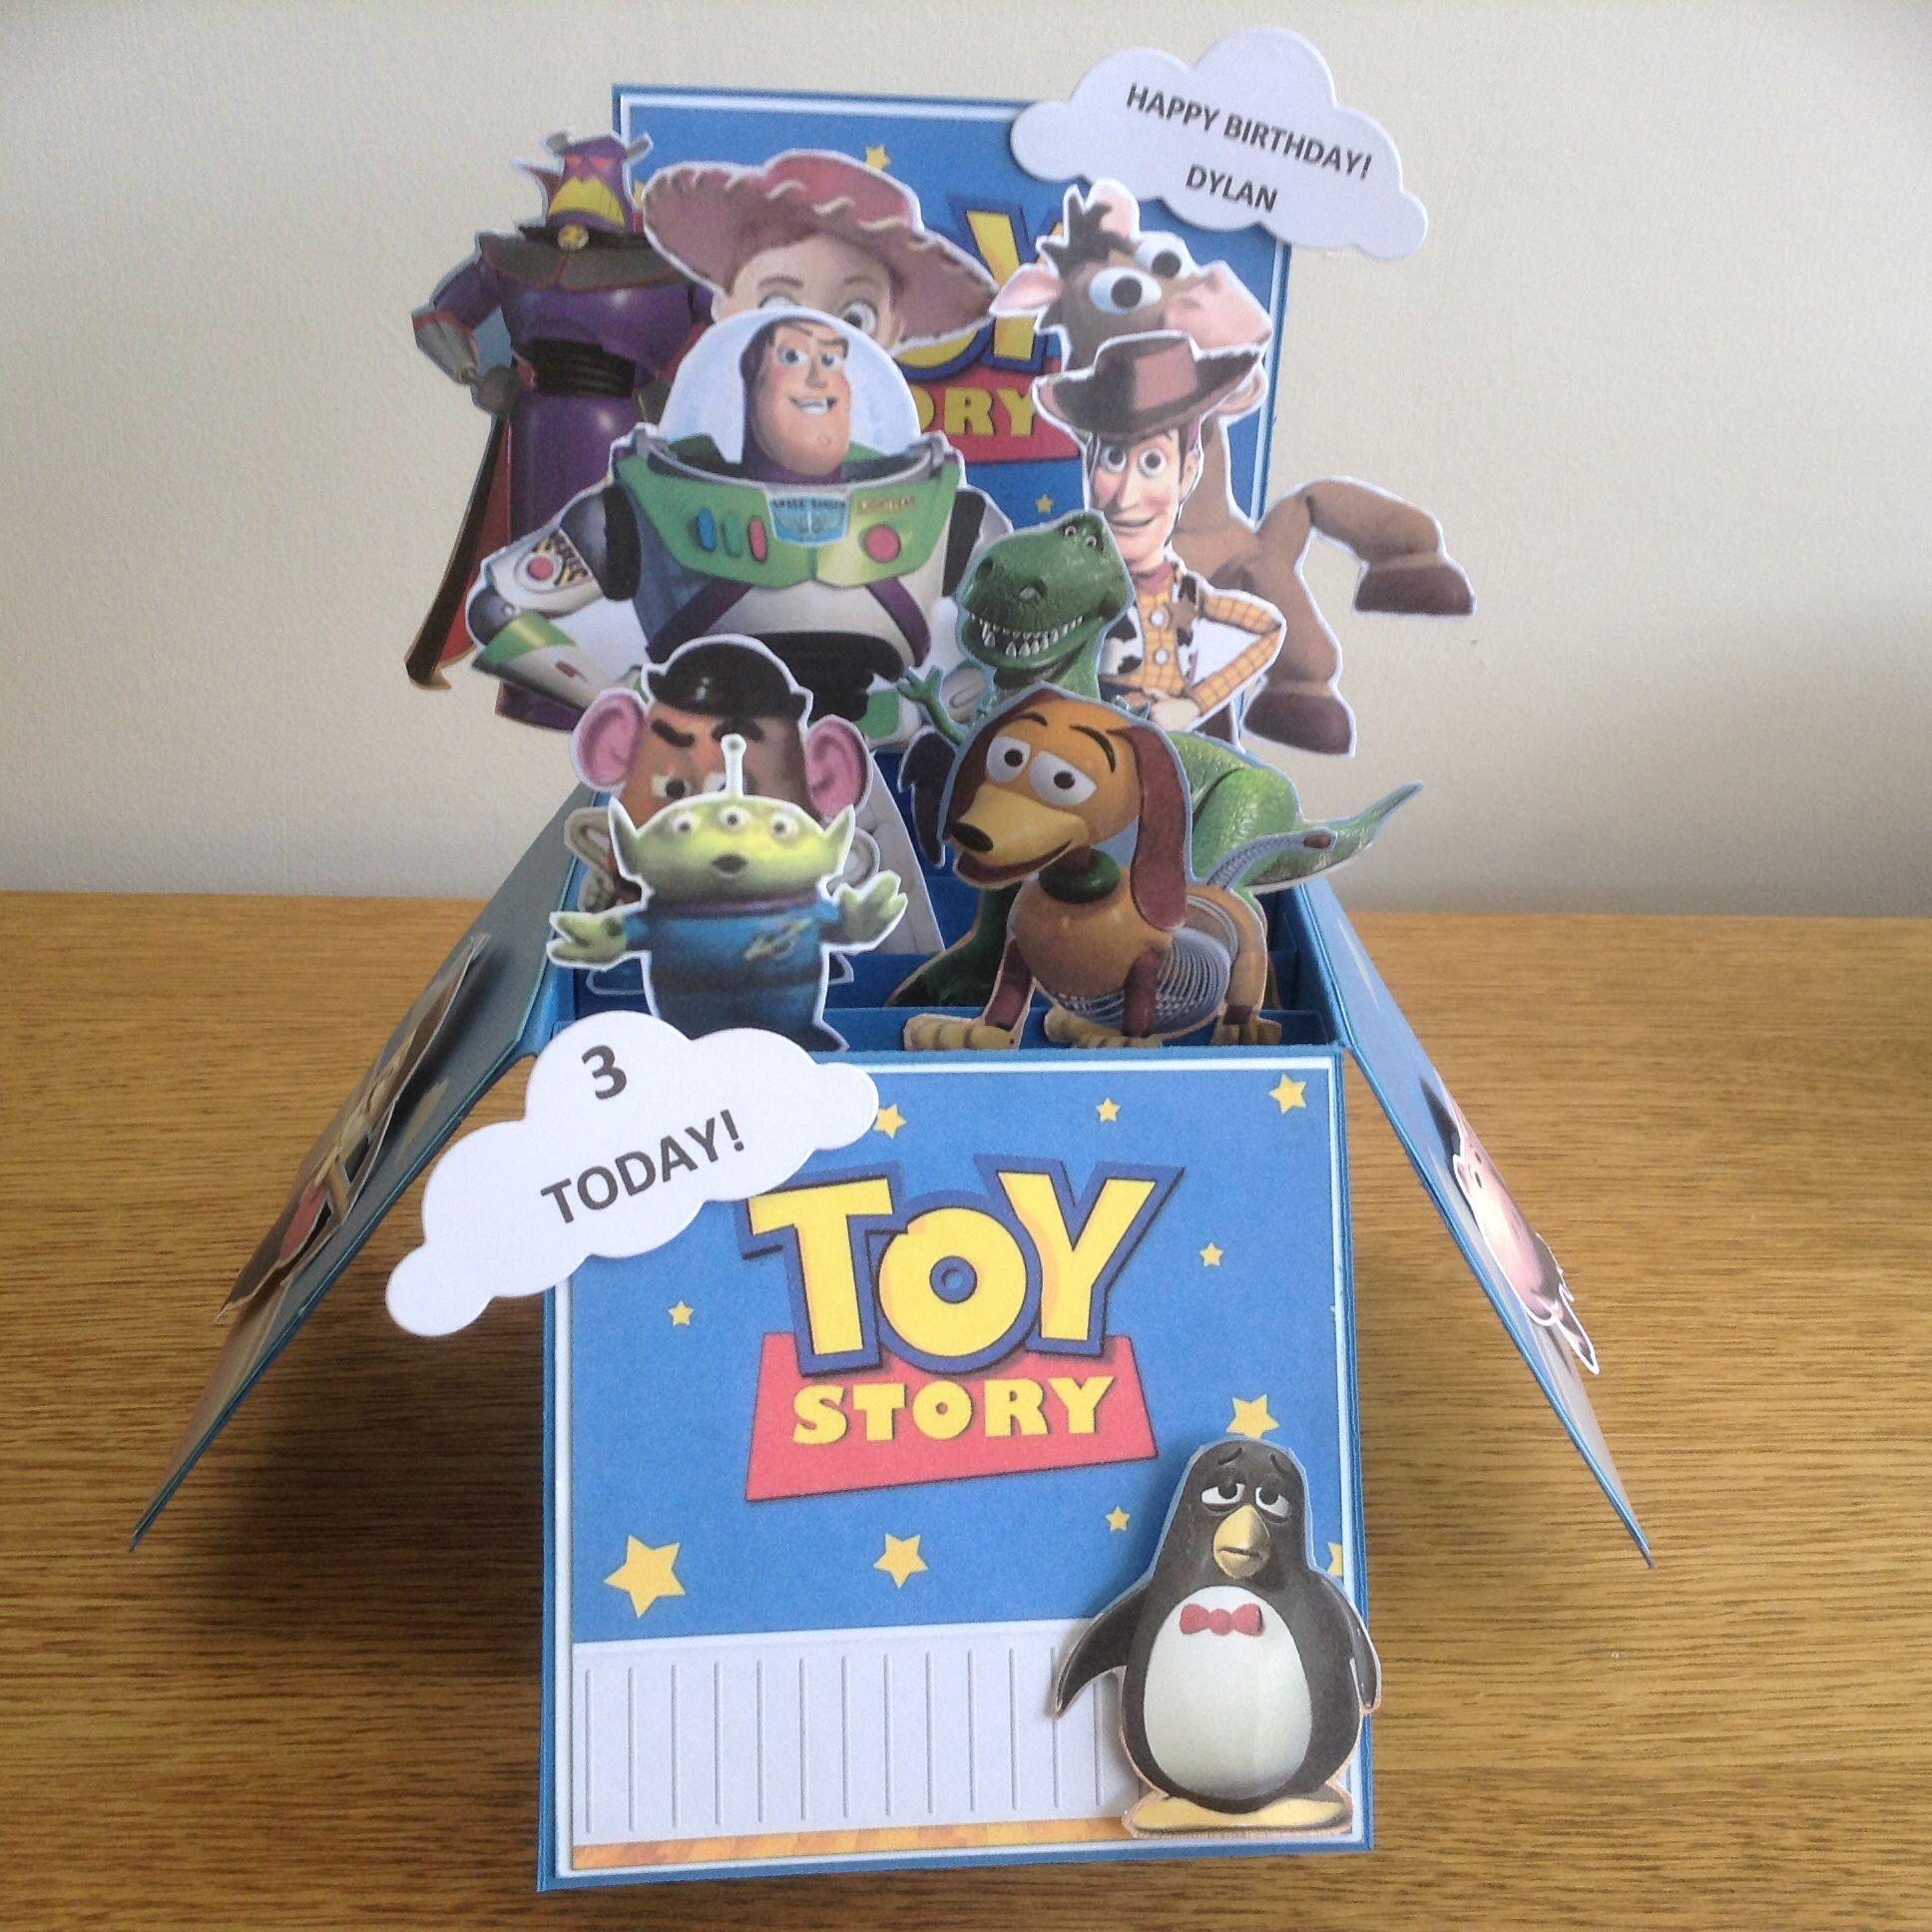 Toy Story Box Birthday Card Boxed Birthday Cards Toy Story Invitations Toy Story Birthday